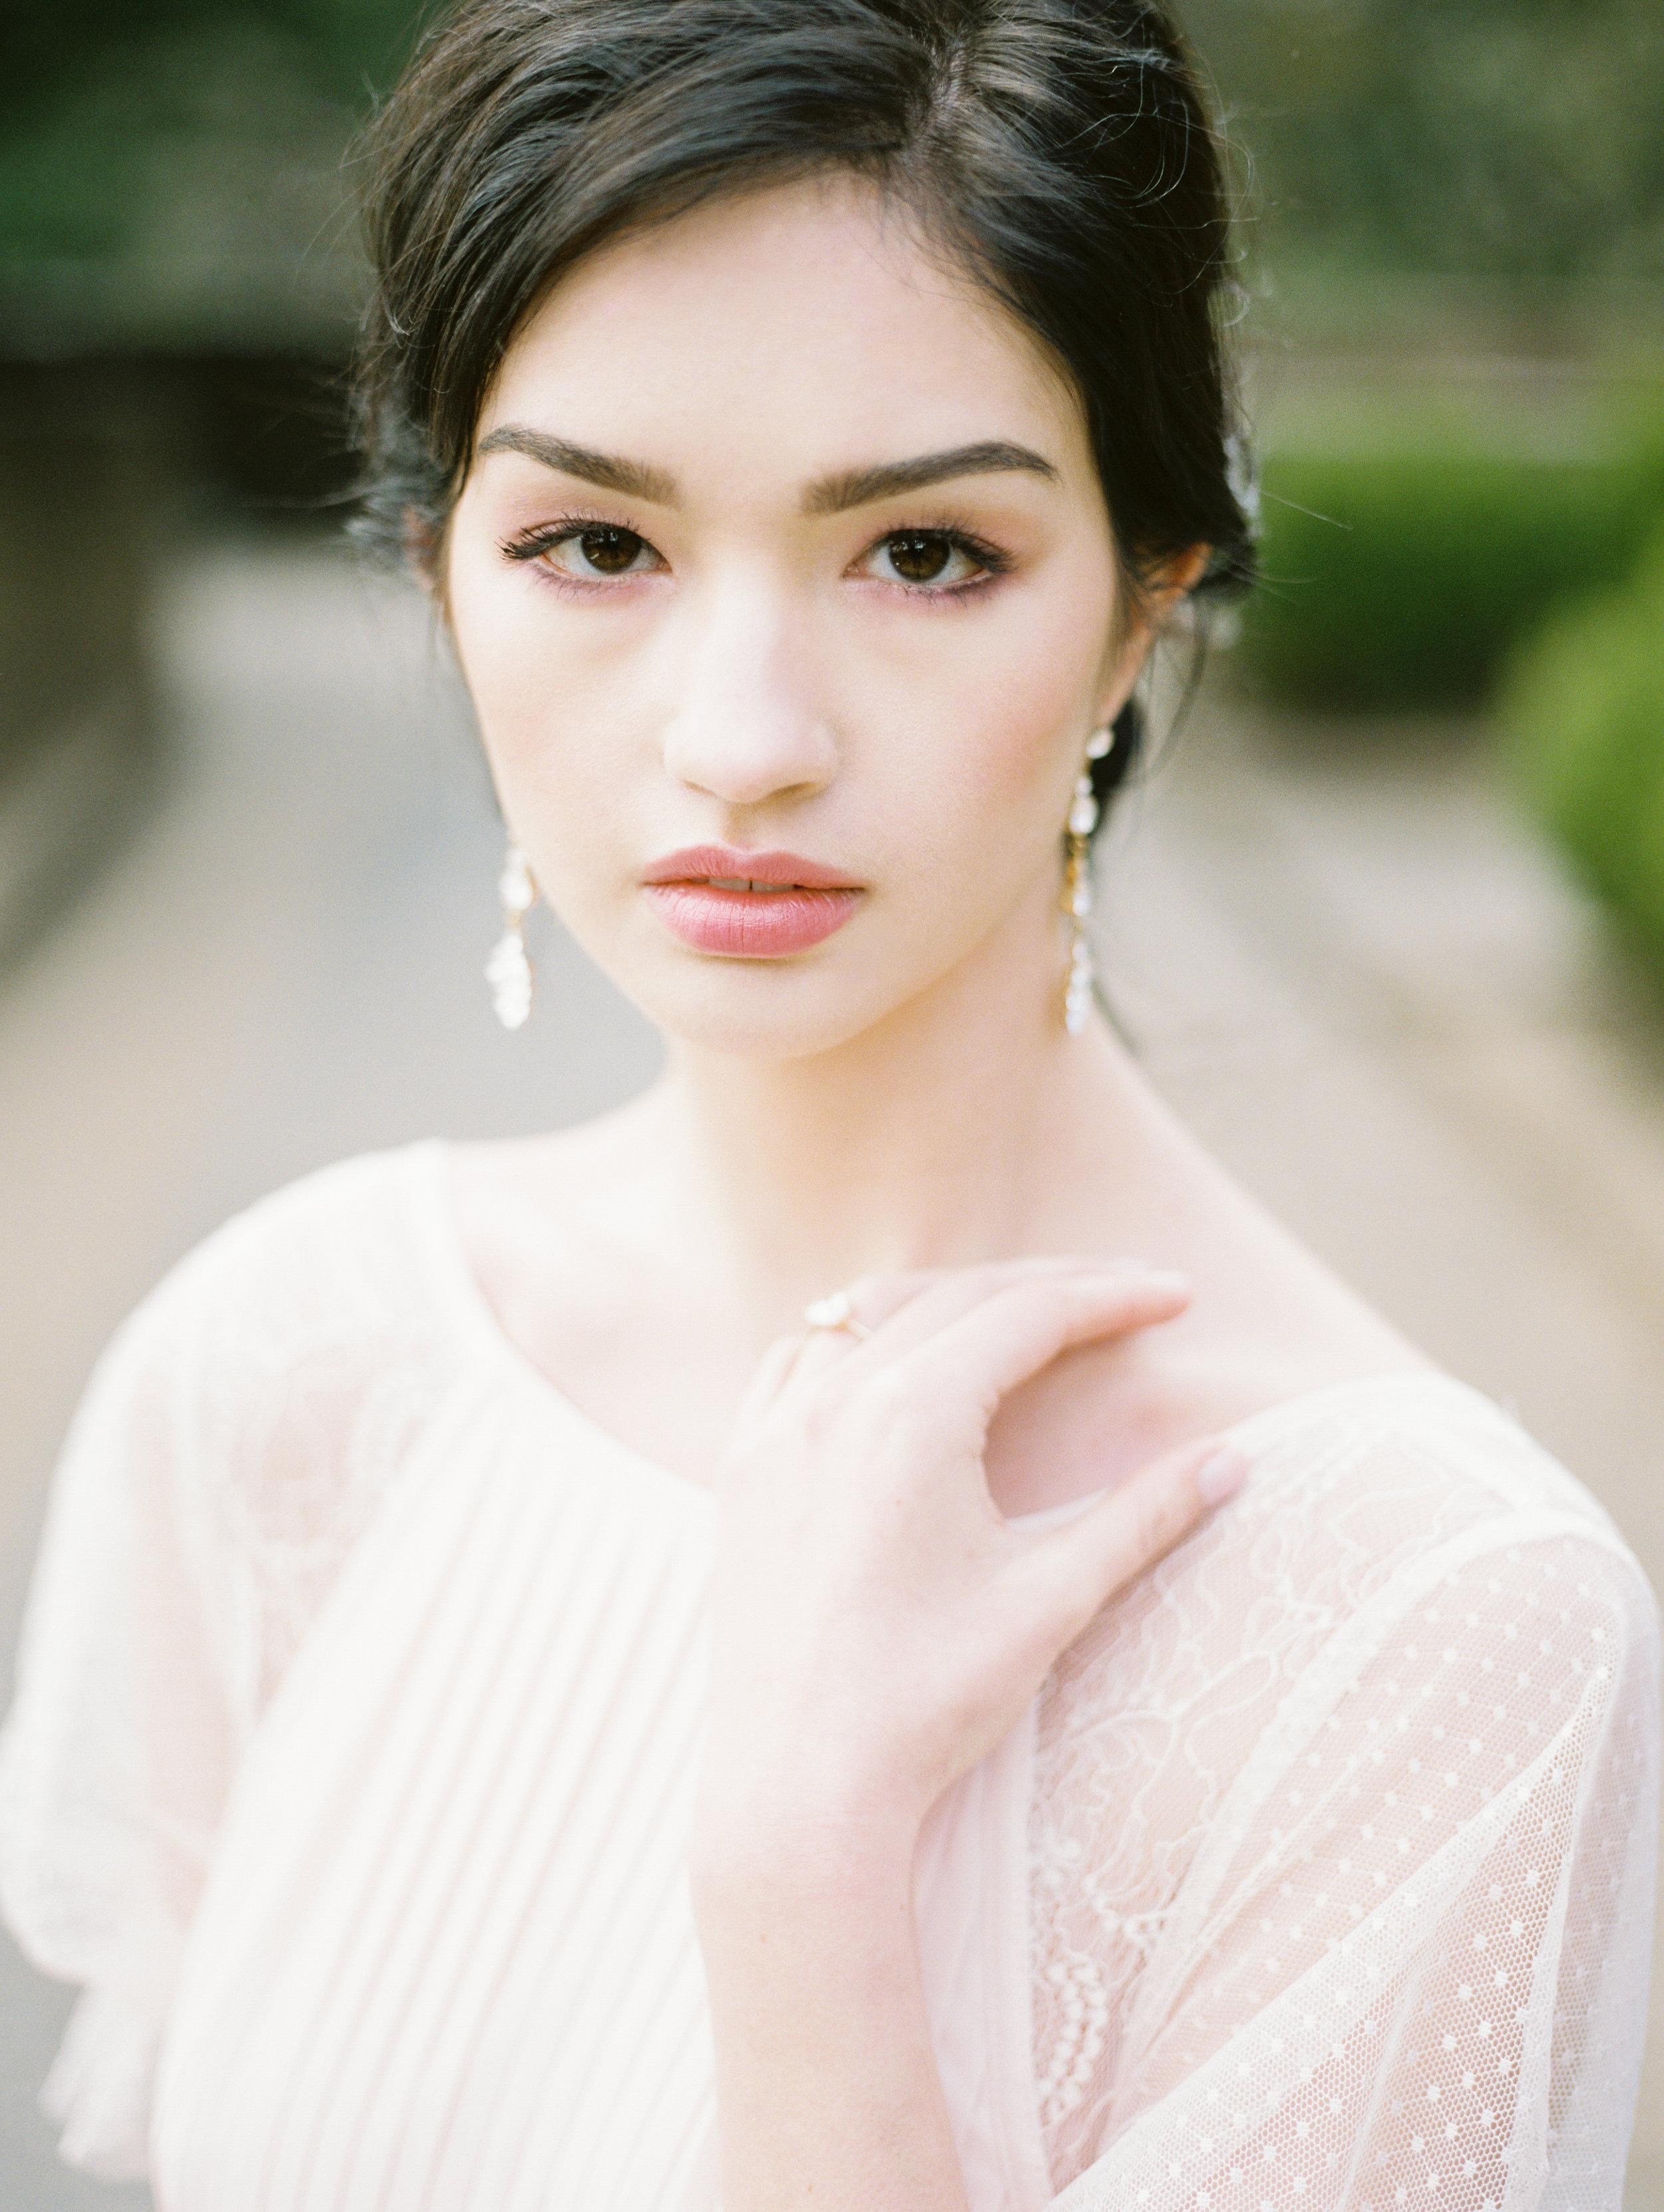 washington-dc-makeup-artist-erica-basha